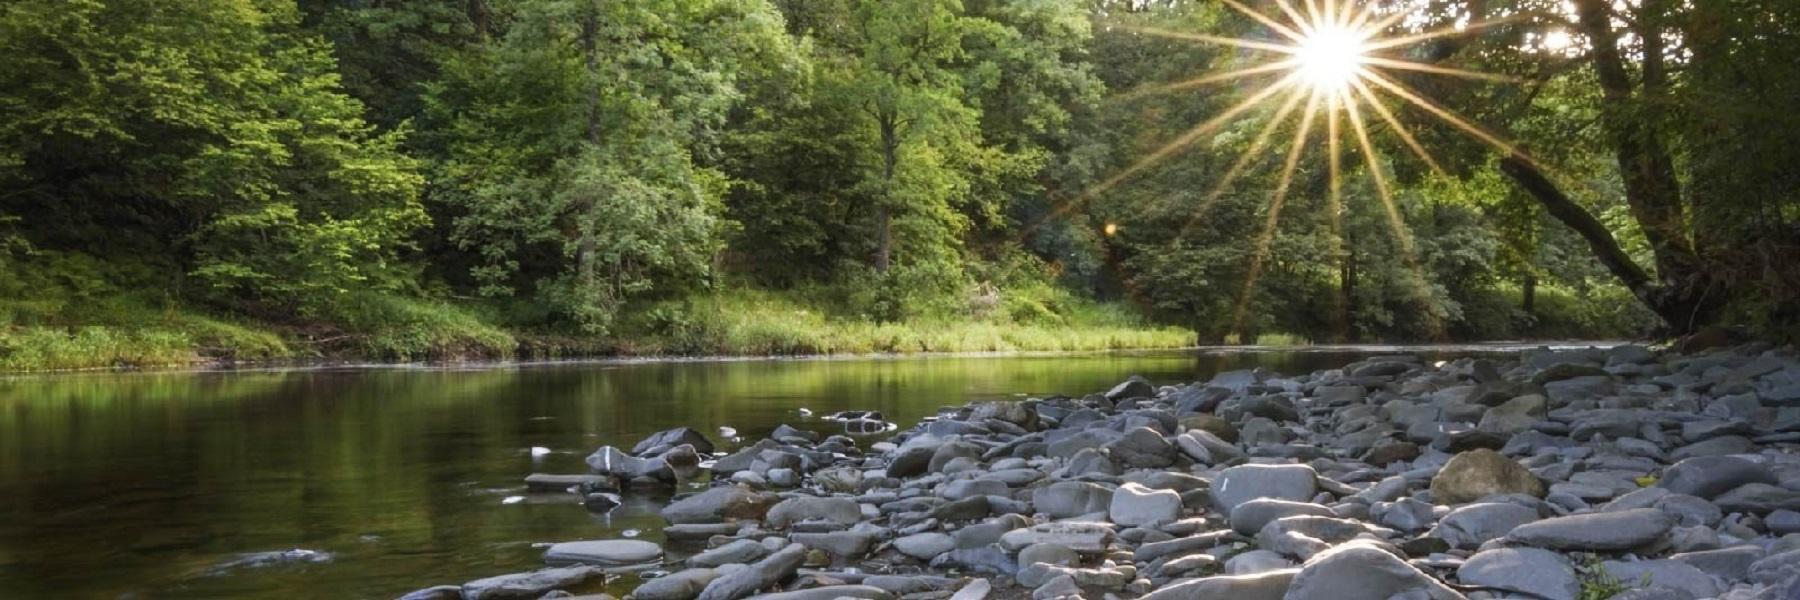 Lune Rivers Trust